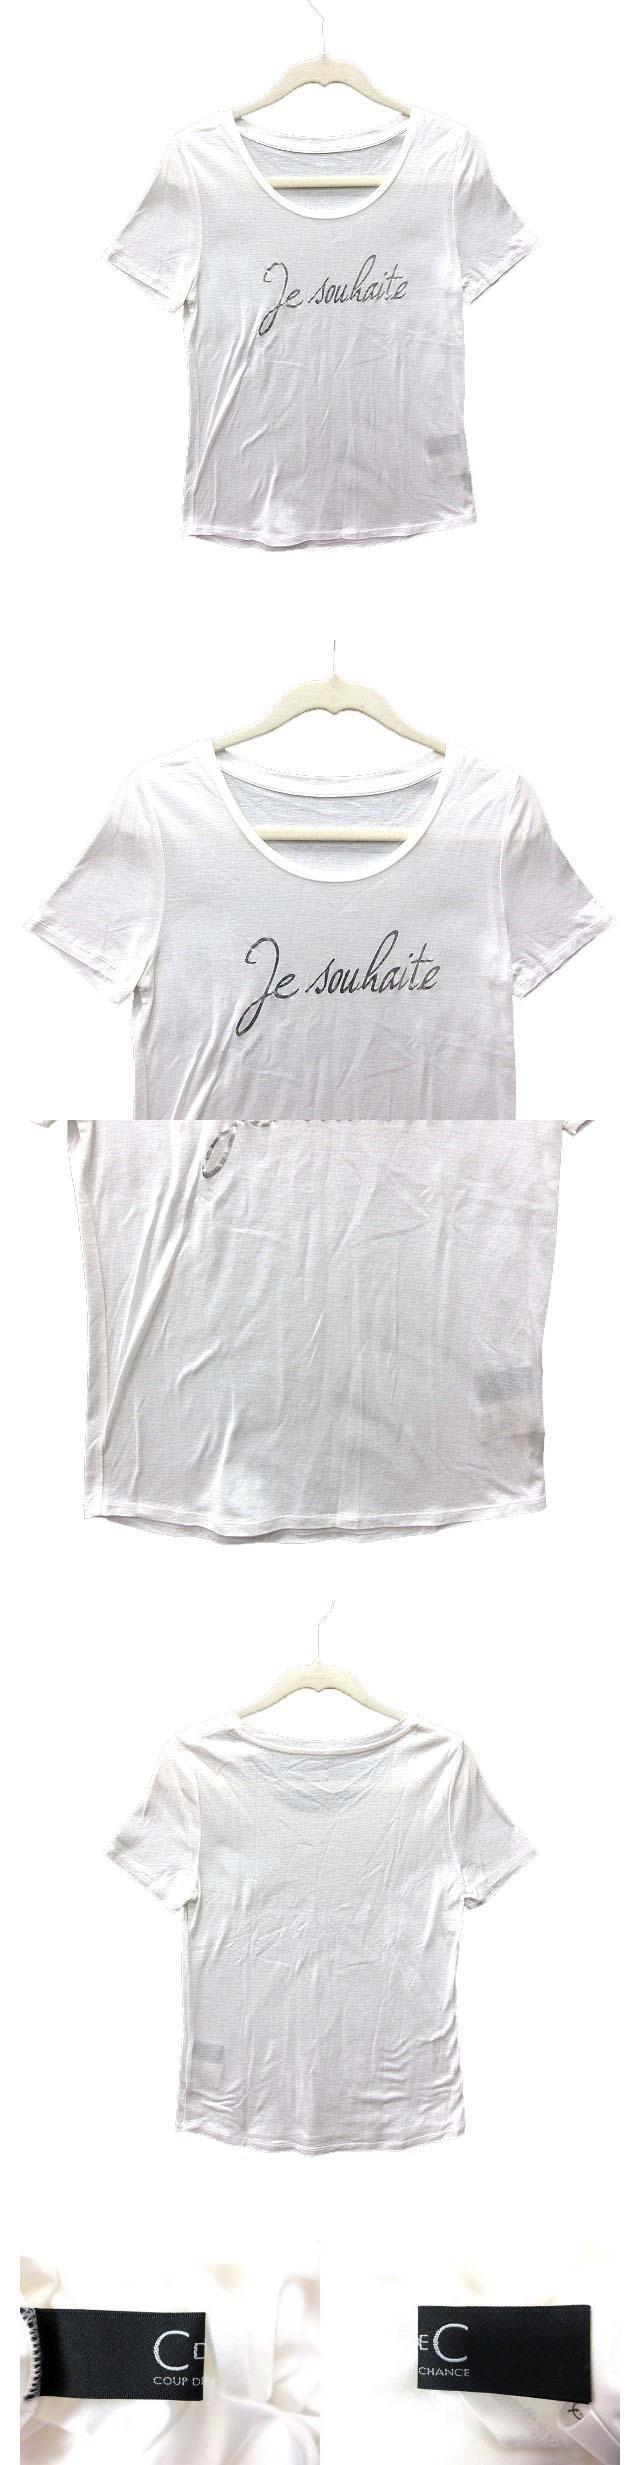 Tシャツ クルーネック プリント 半袖 34 白 ホワイト /YK